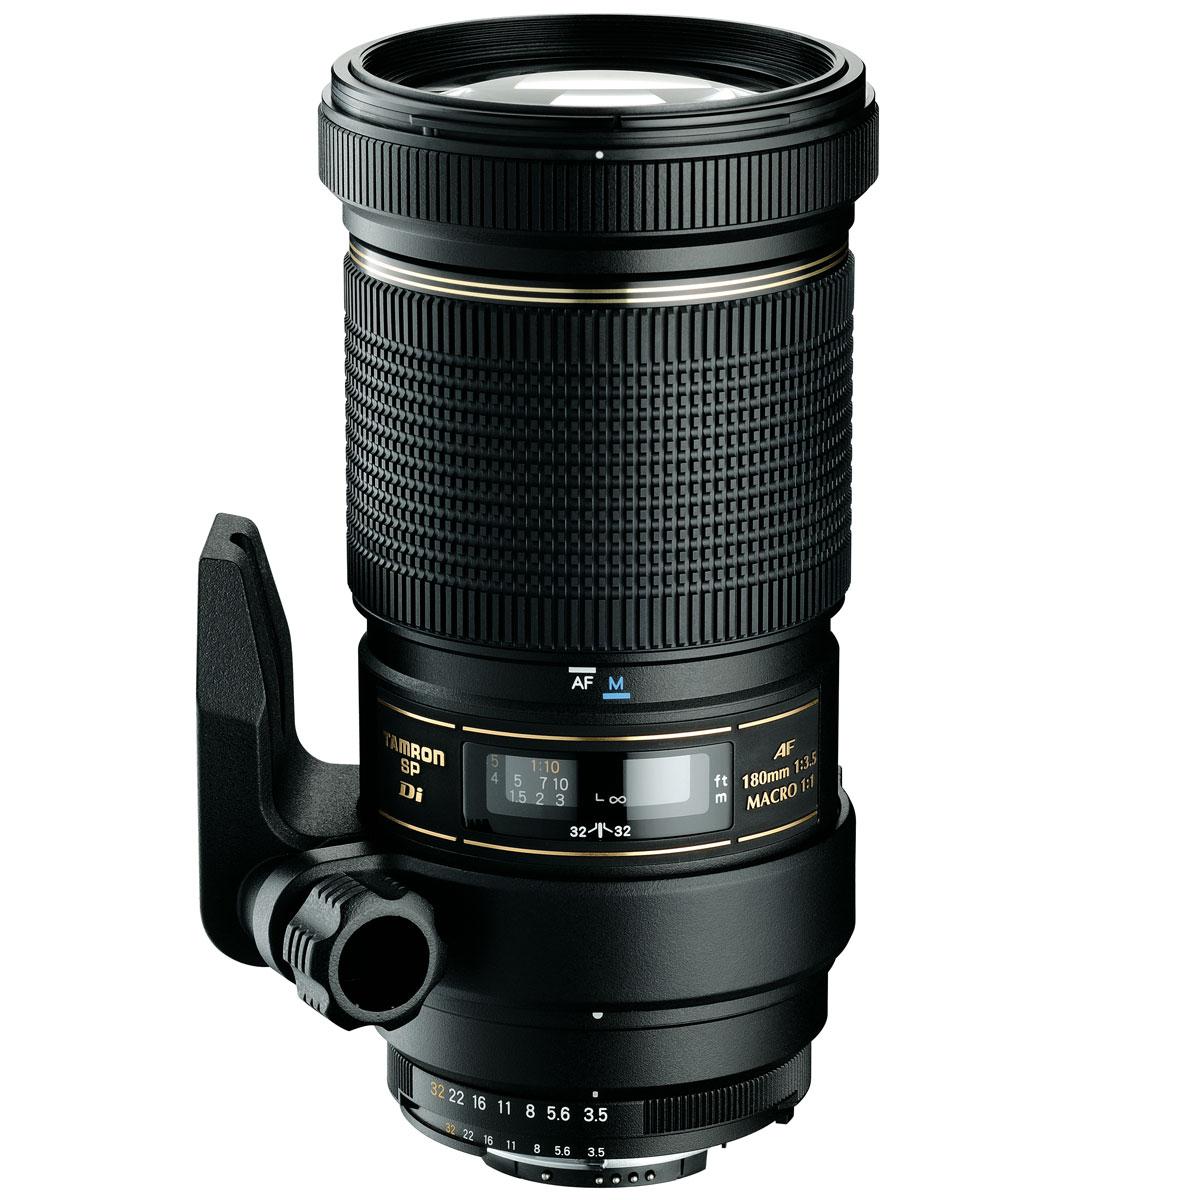 Tamron SP AF 180mm F/3.5 Di LD Macro, Sony объектив